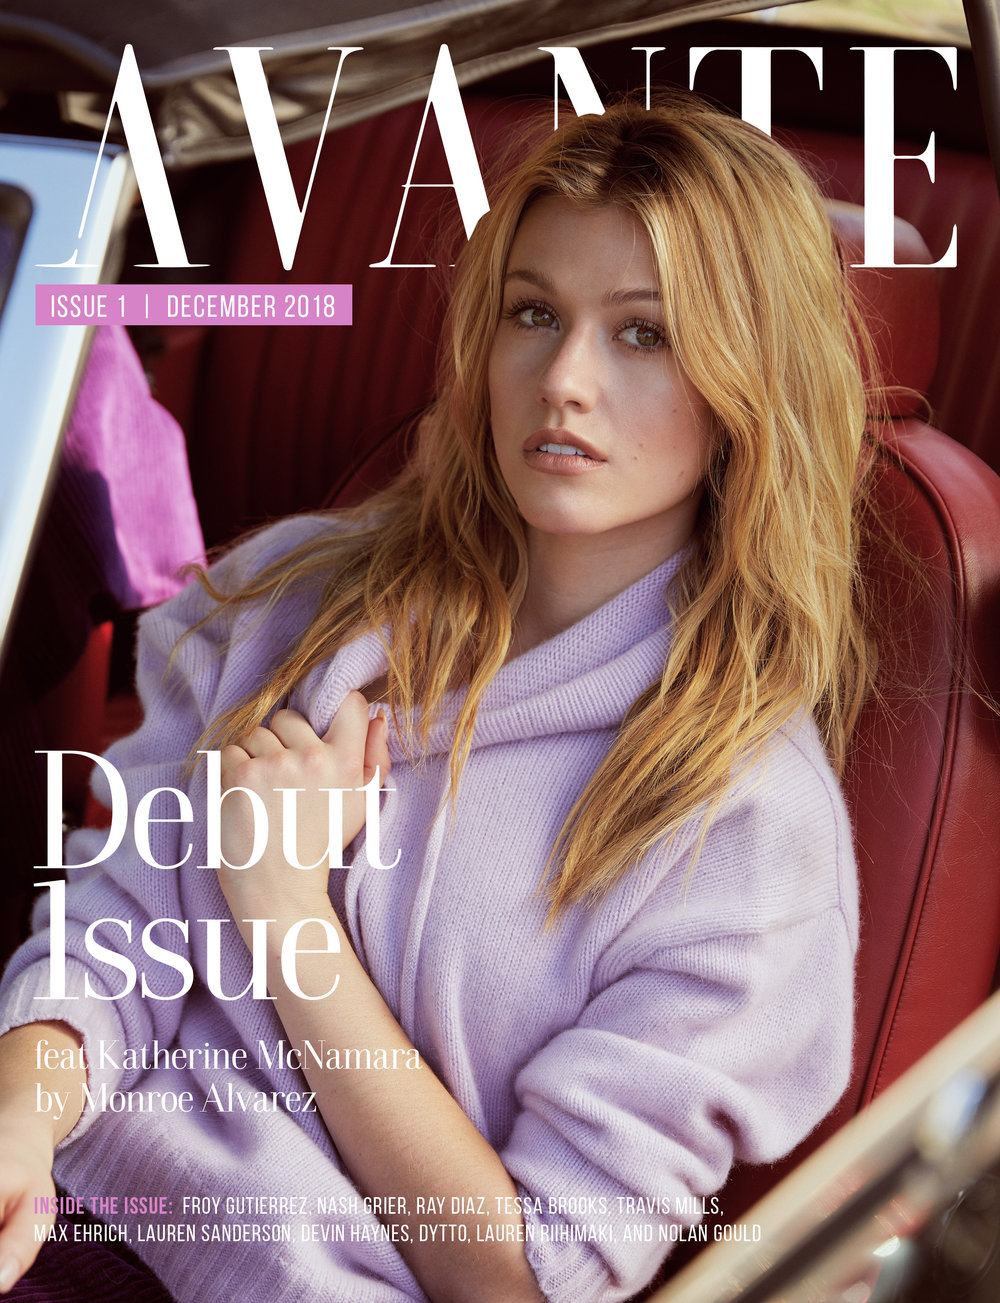 Kat McNamara for Avante Magazine December 2018